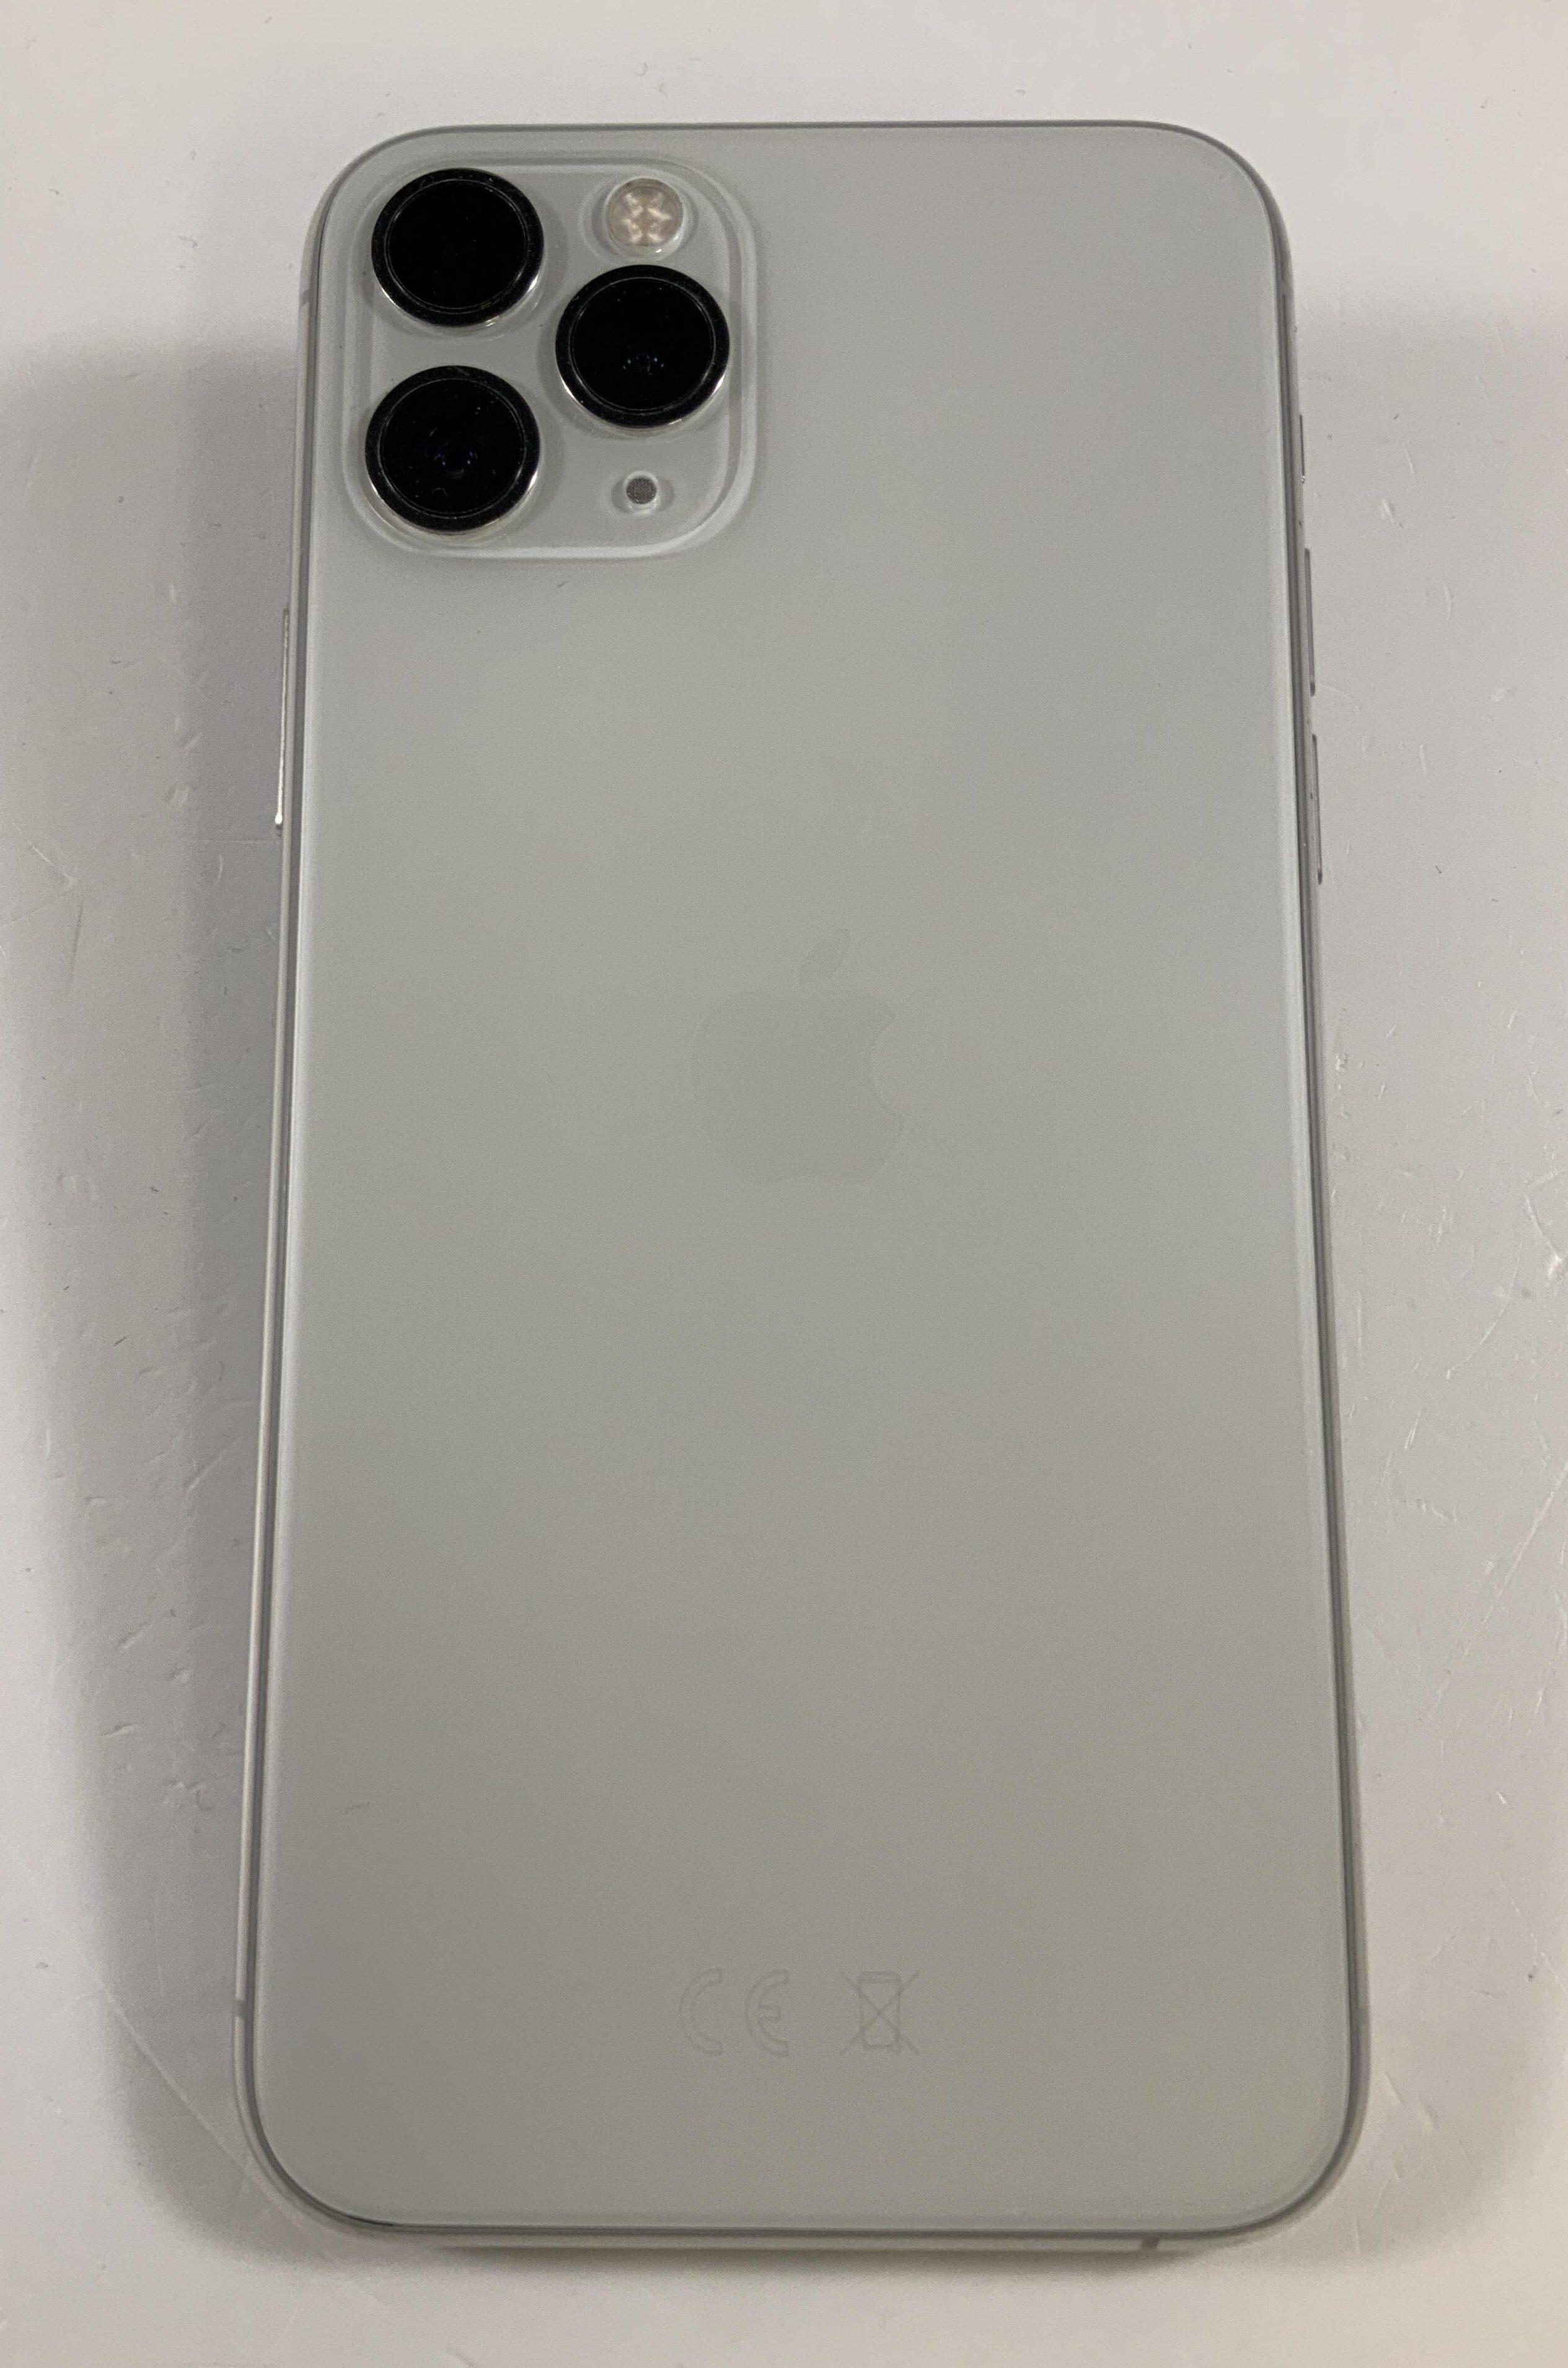 iPhone 11 Pro 64GB, 64GB, Silver, image 2